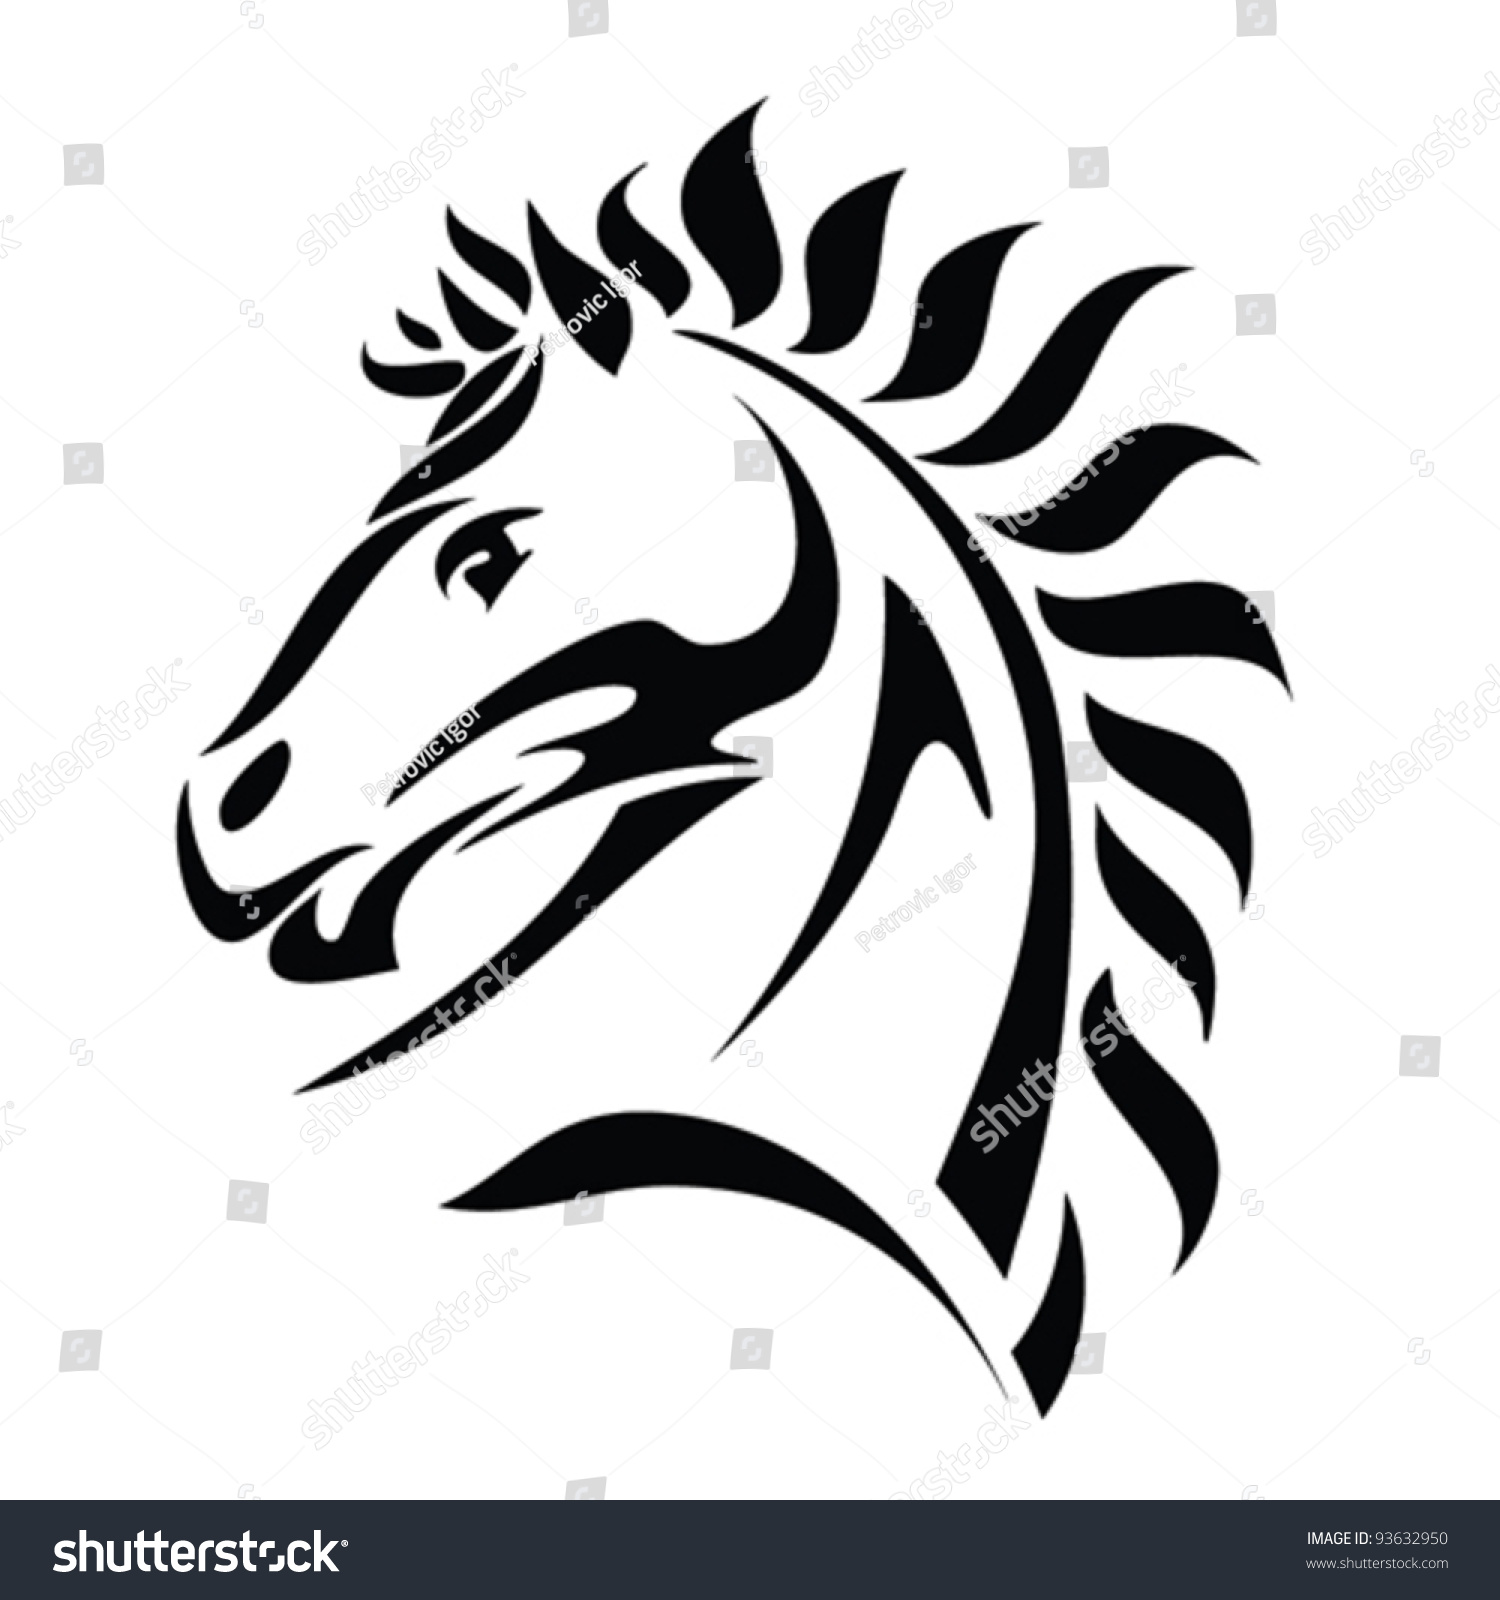 Tribal horse head tattoo vector illustration stock vector for Horse head tattoo designs